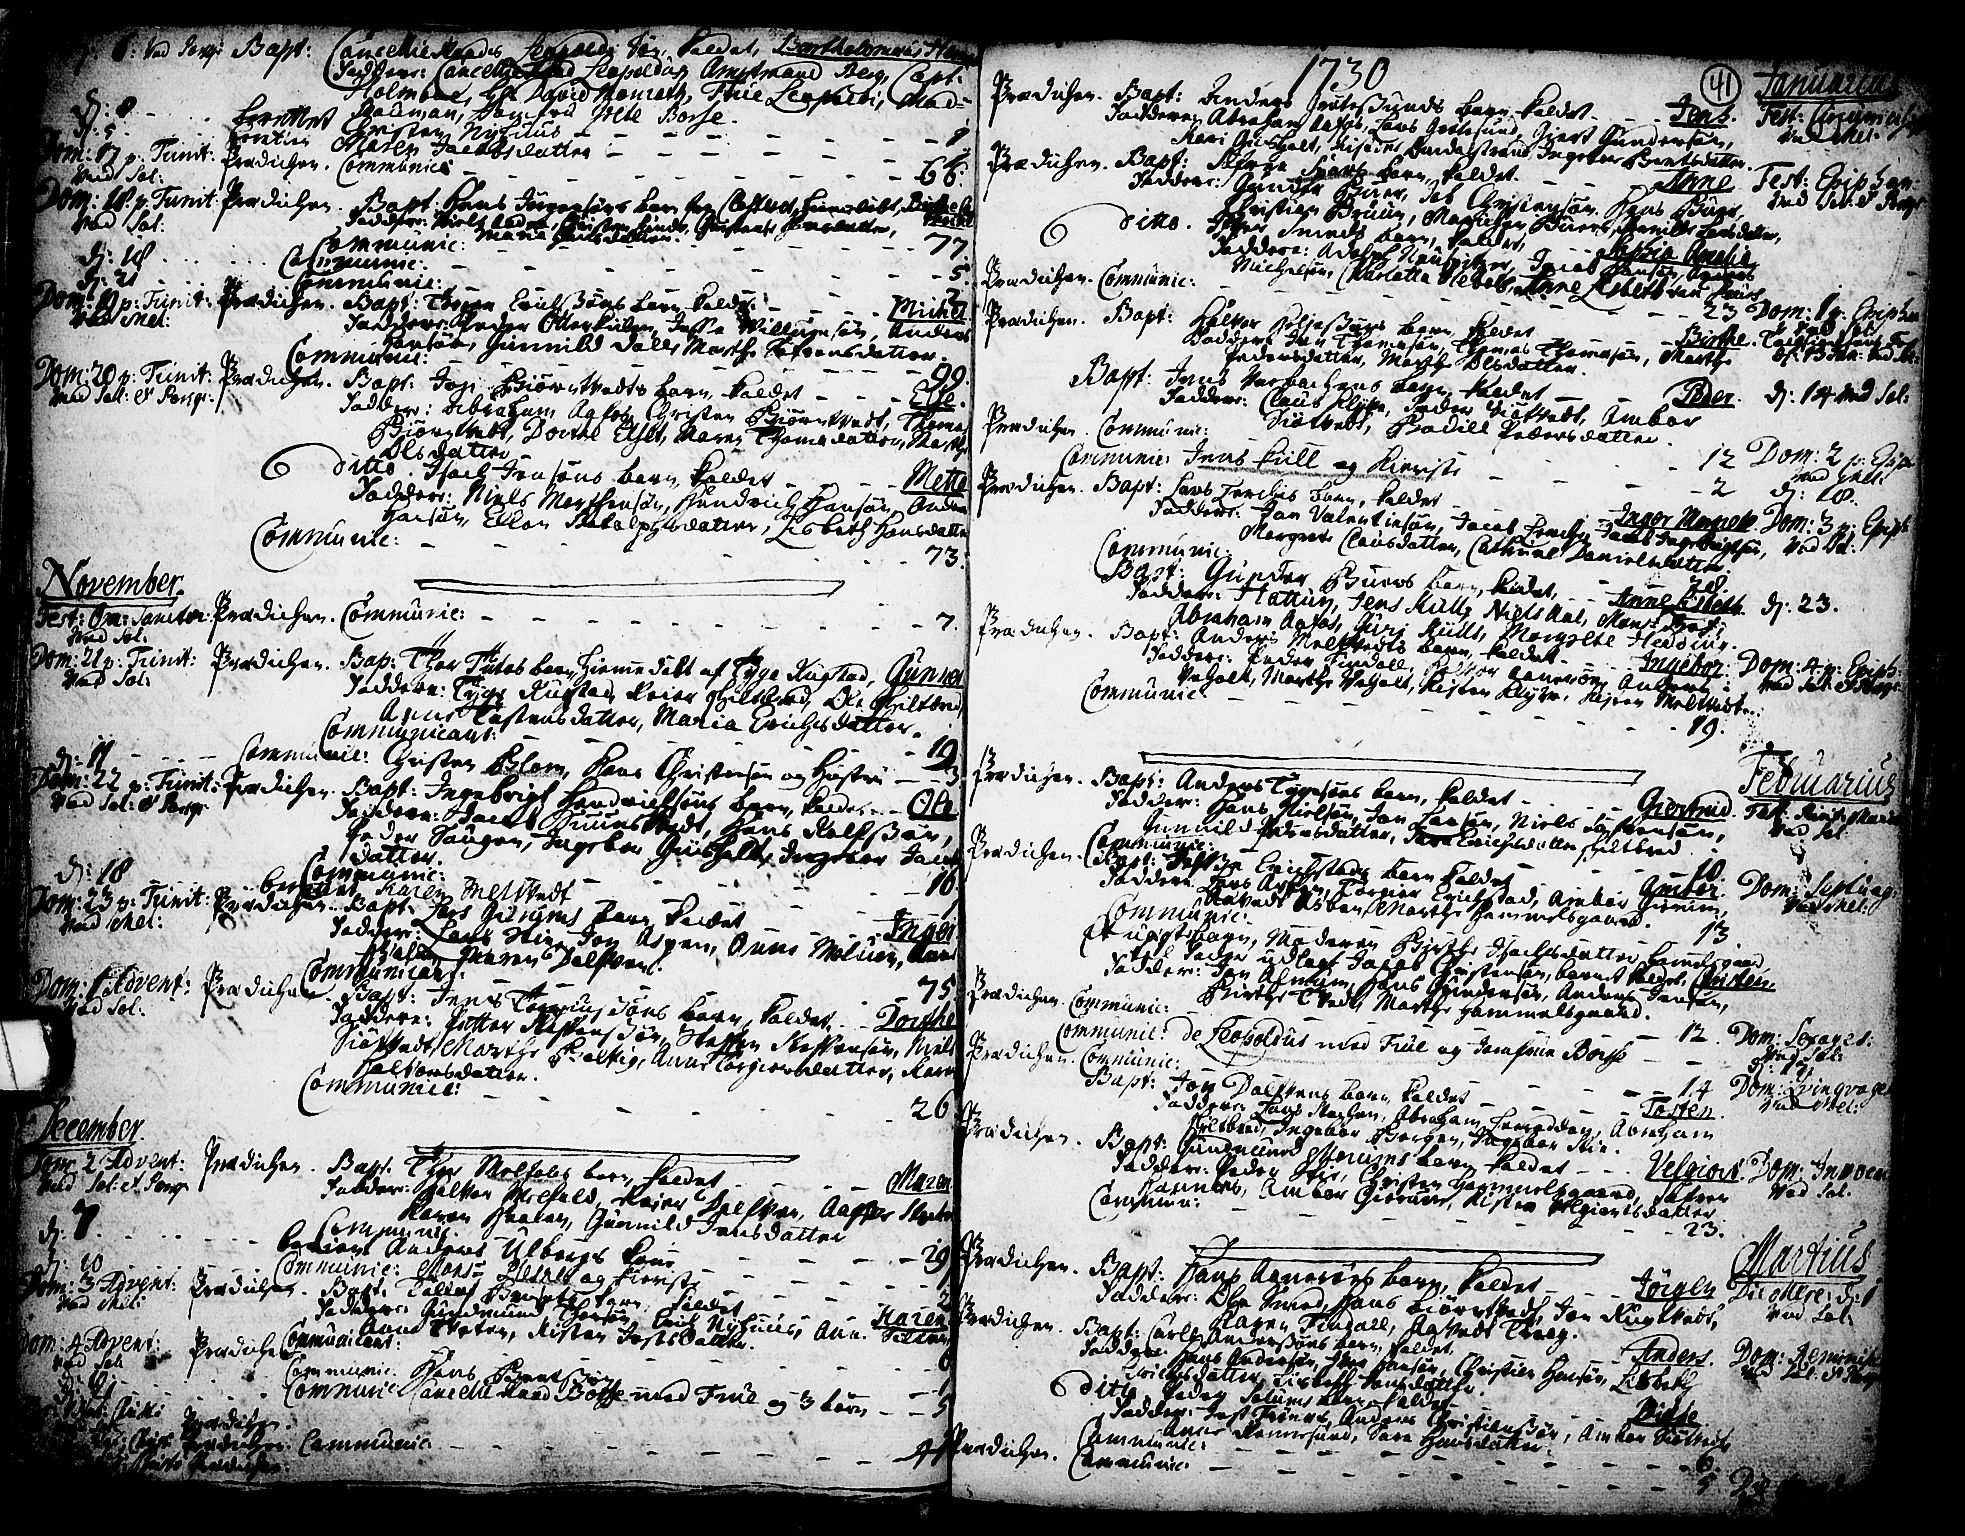 SAKO, Solum kirkebøker, F/Fa/L0002: Ministerialbok nr. I 2, 1713-1761, s. 41